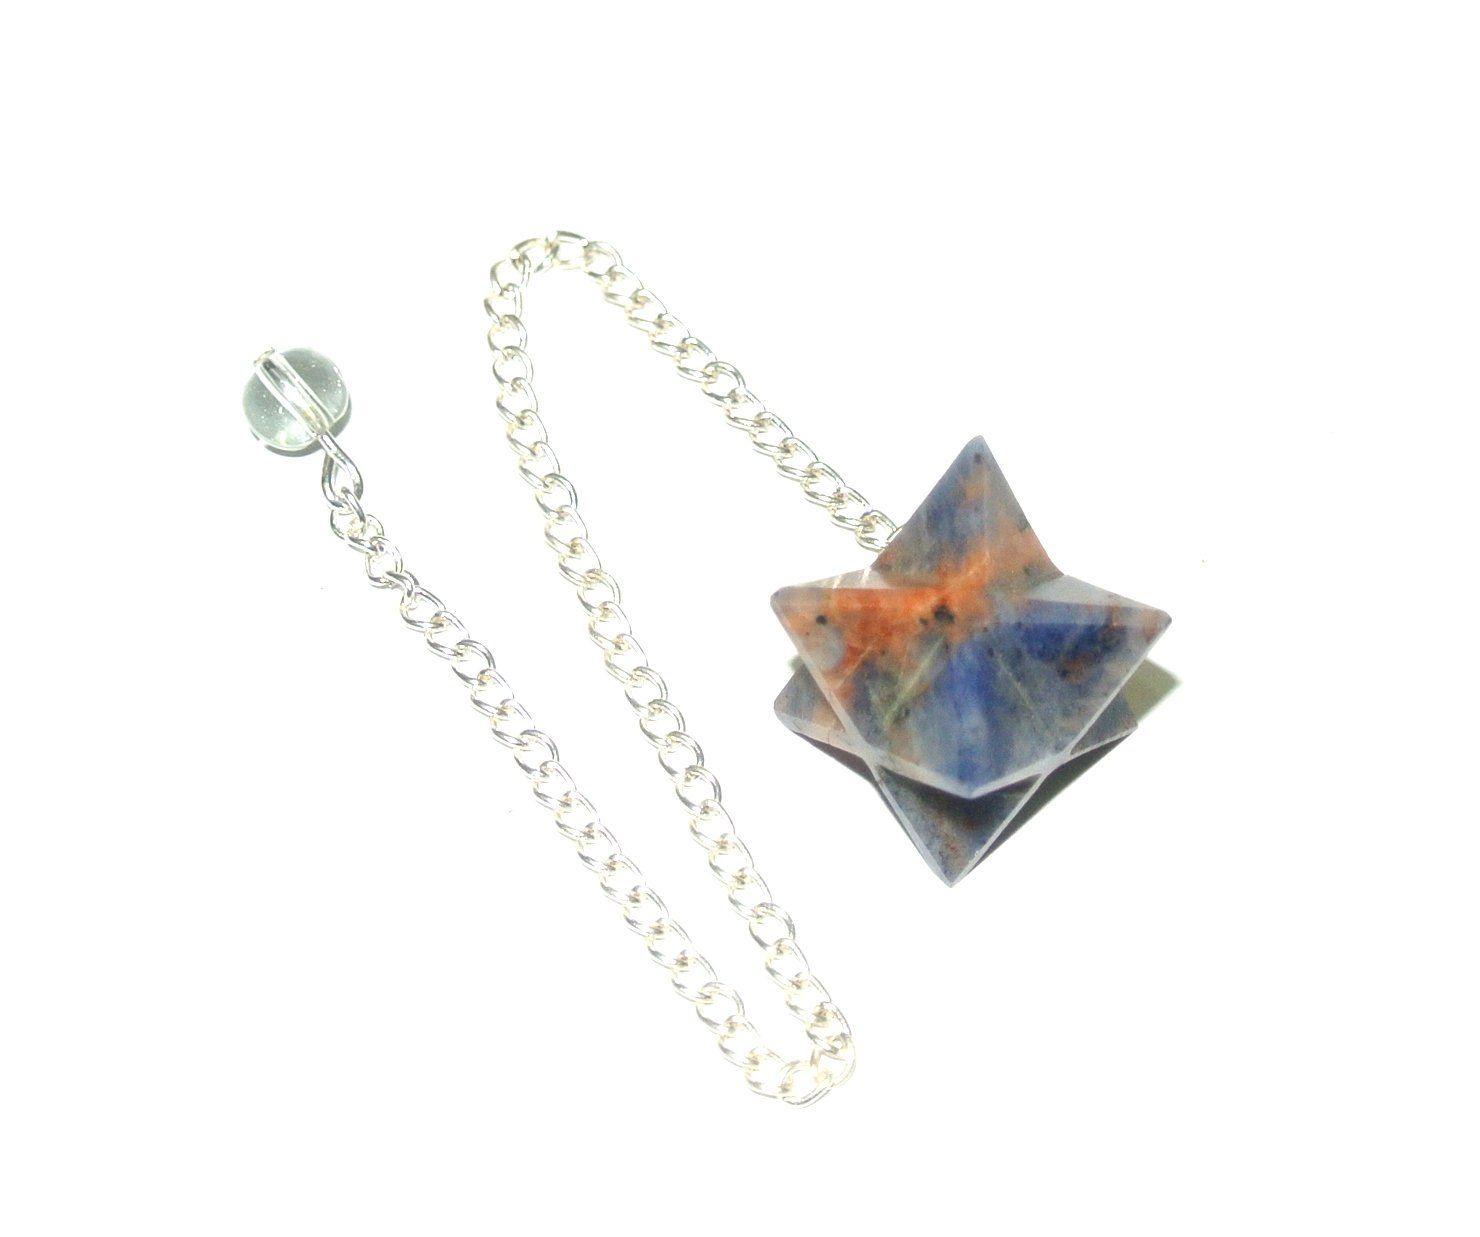 Boho Spiritual Jewelry Merkaba Goldstone Gemstone Star Pendant